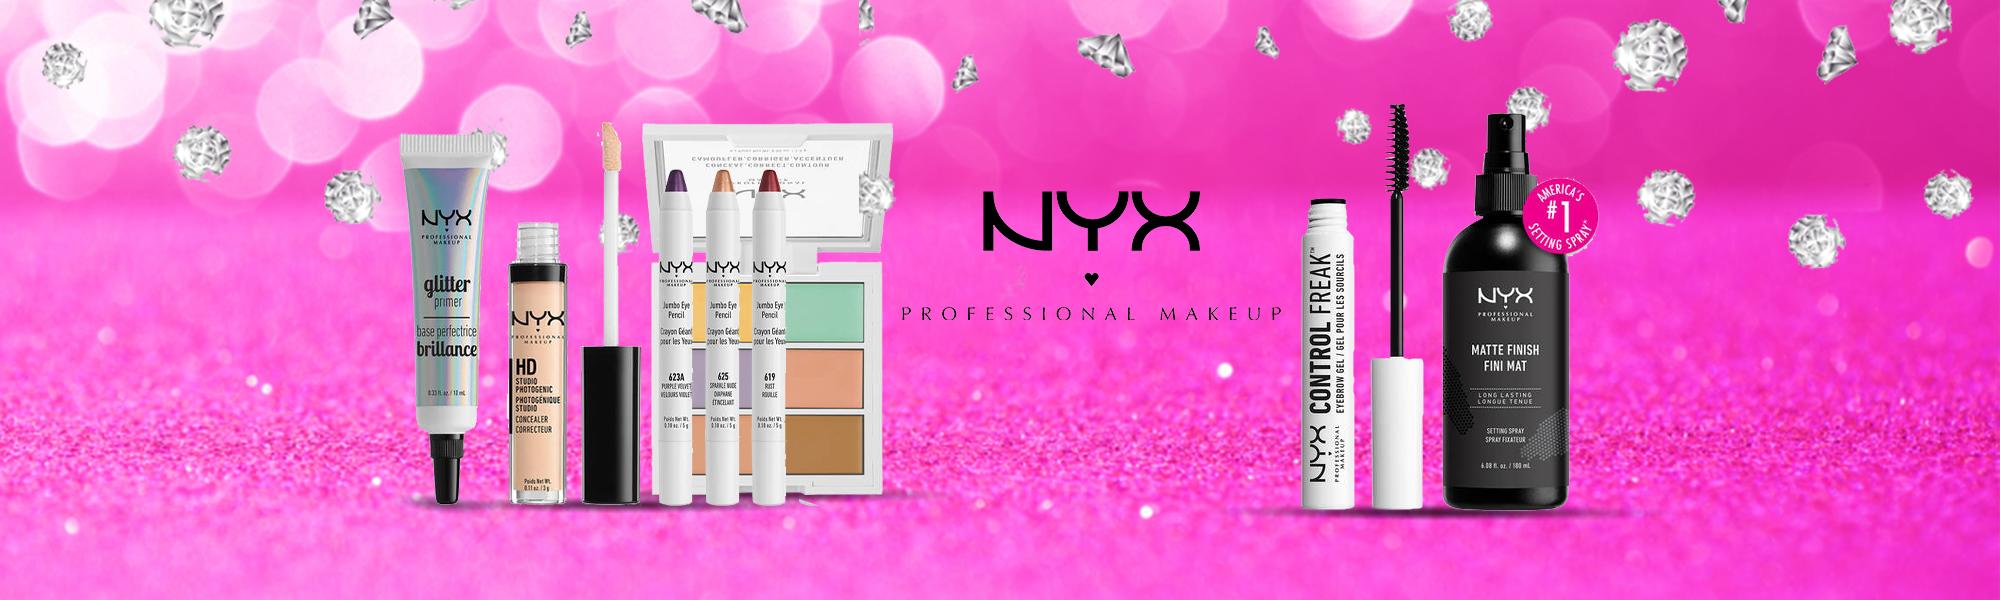 NYX Professional